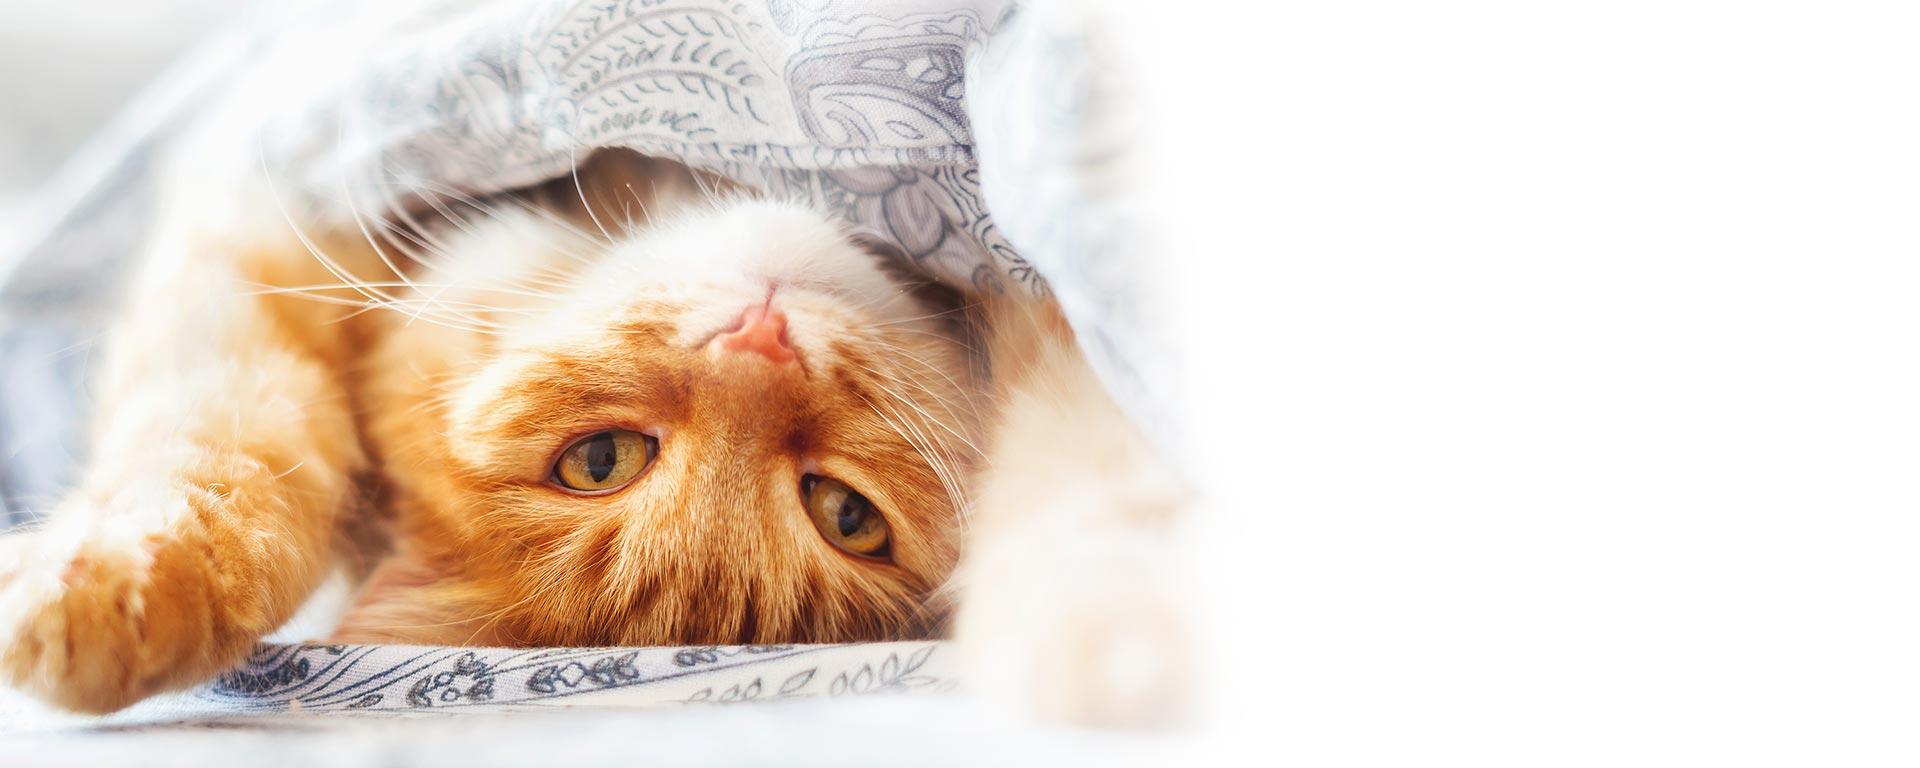 https://www.myhappypets.com/sites/default/files/revslider/image/zylkene-hero-cat.jpg